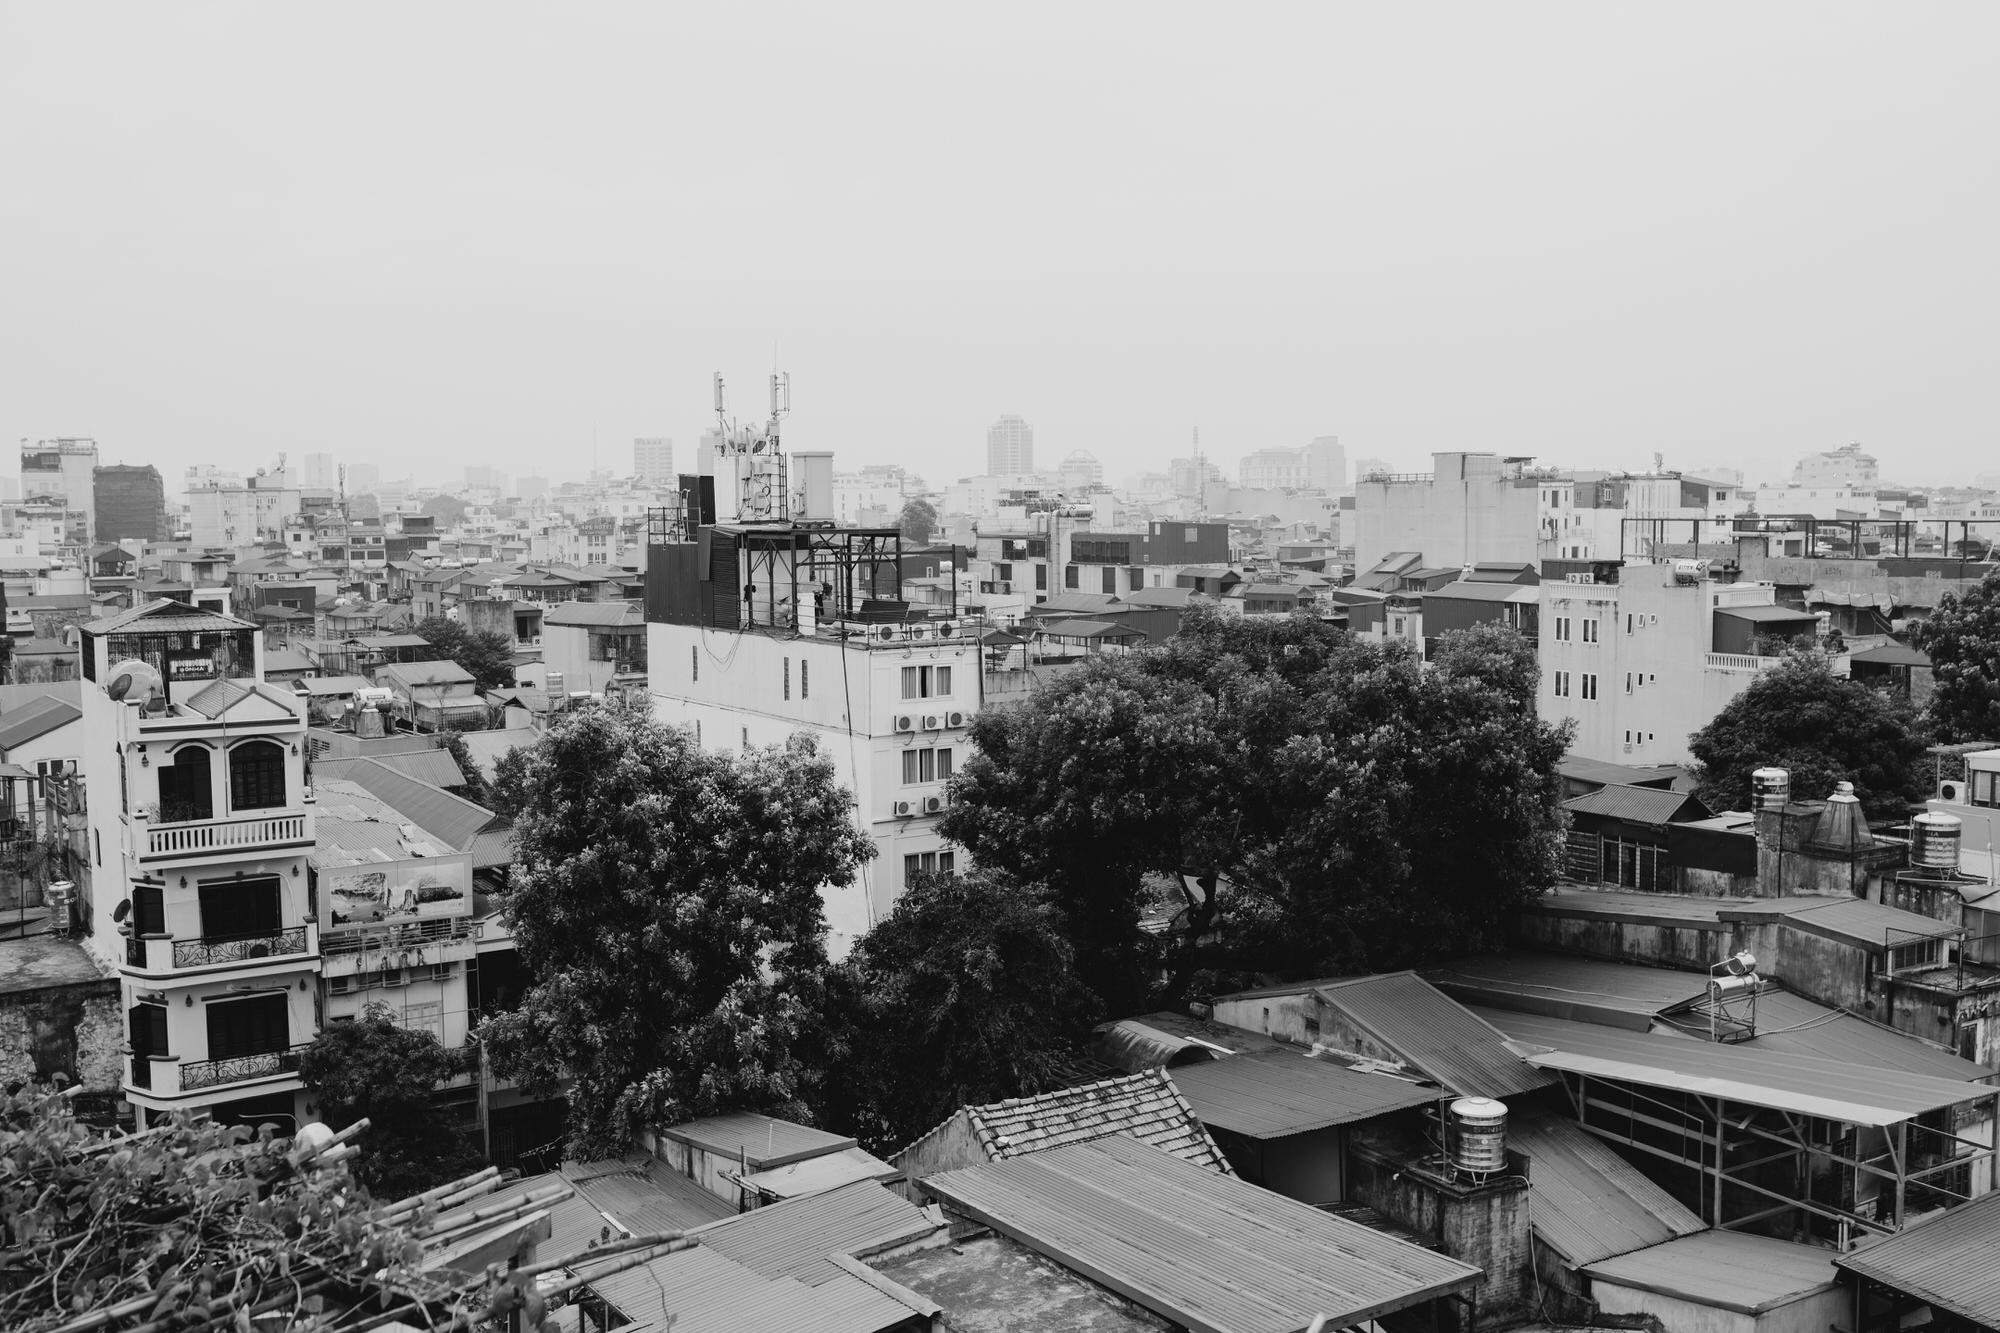 hanoivietnamcitytravelblog-9713-1.jpg